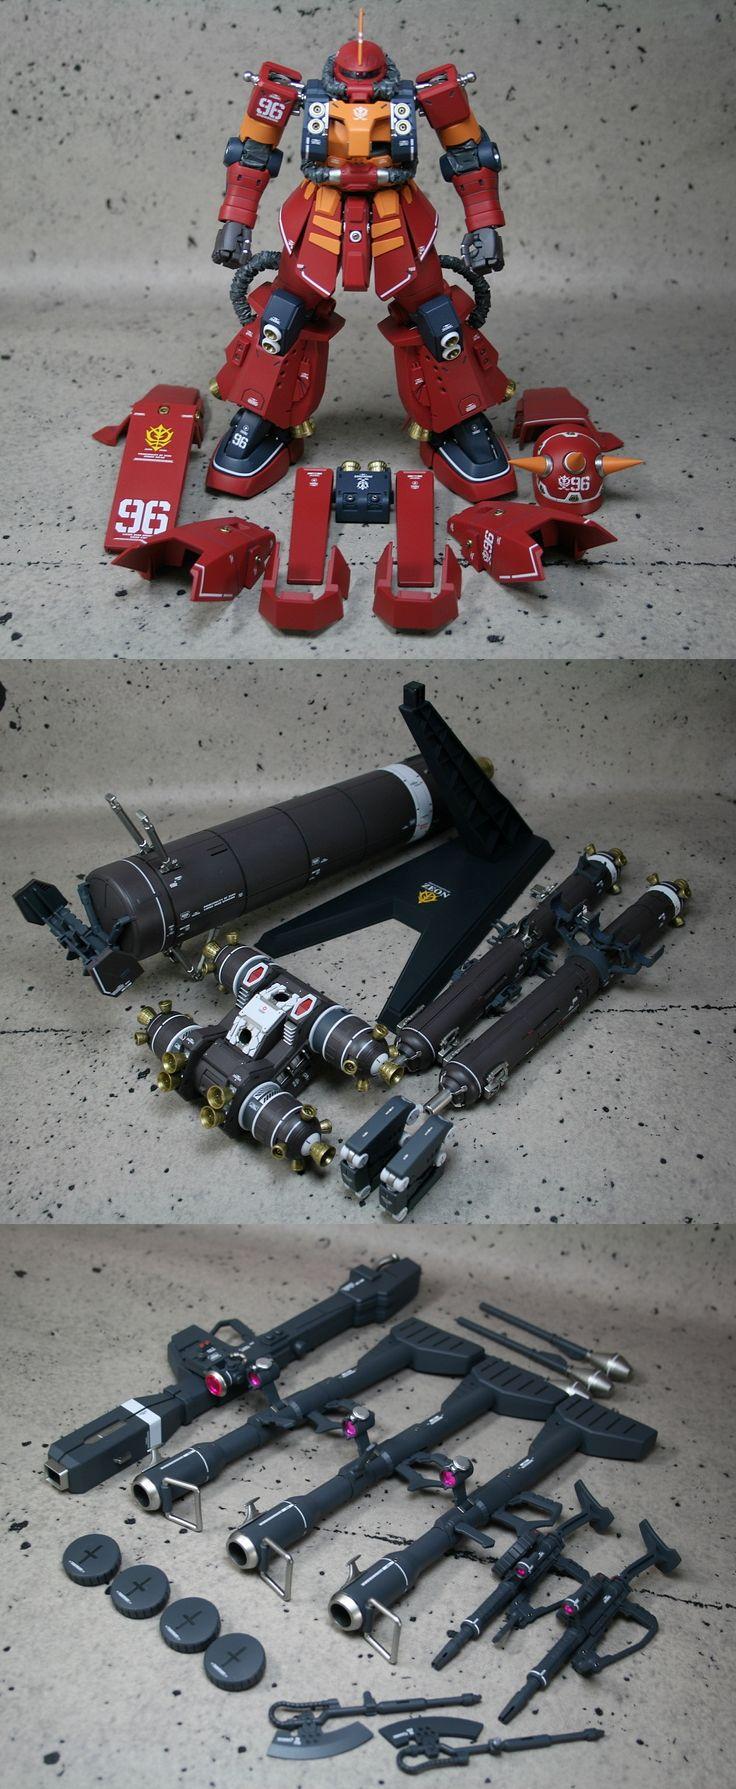 MG 1/100 サイコザク (ver.ka.THUNDERBOLT版) 塗装済改修完成品 - ヤフオク!